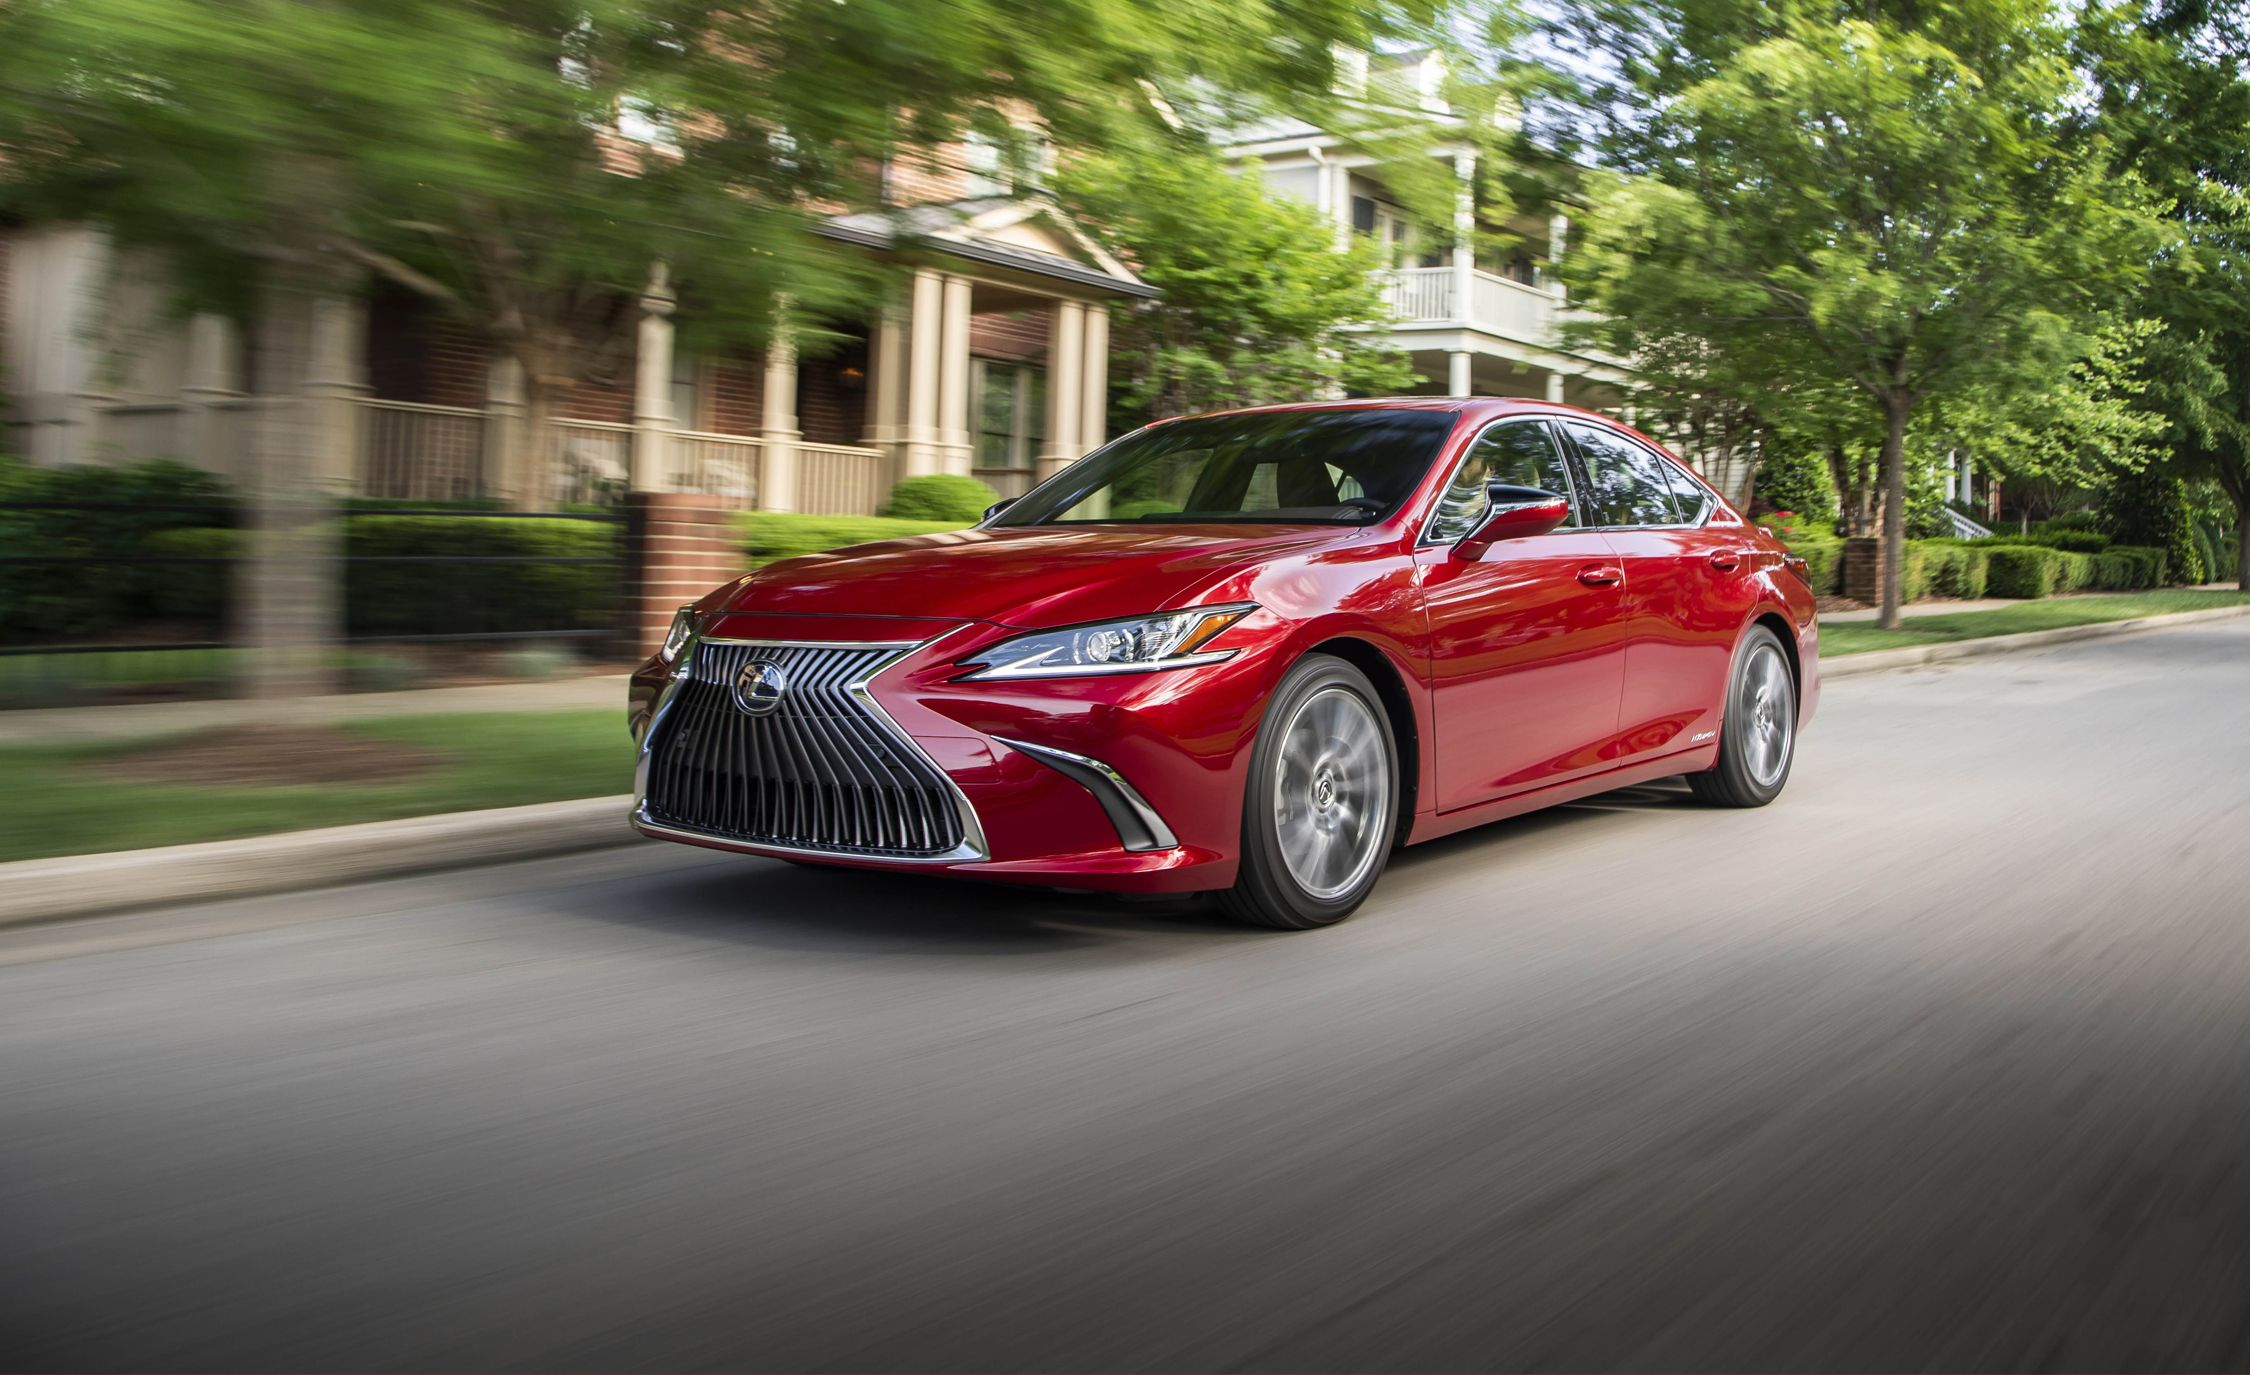 2019 Lexus ES First Drive: Elegance Greets Athleticism ...